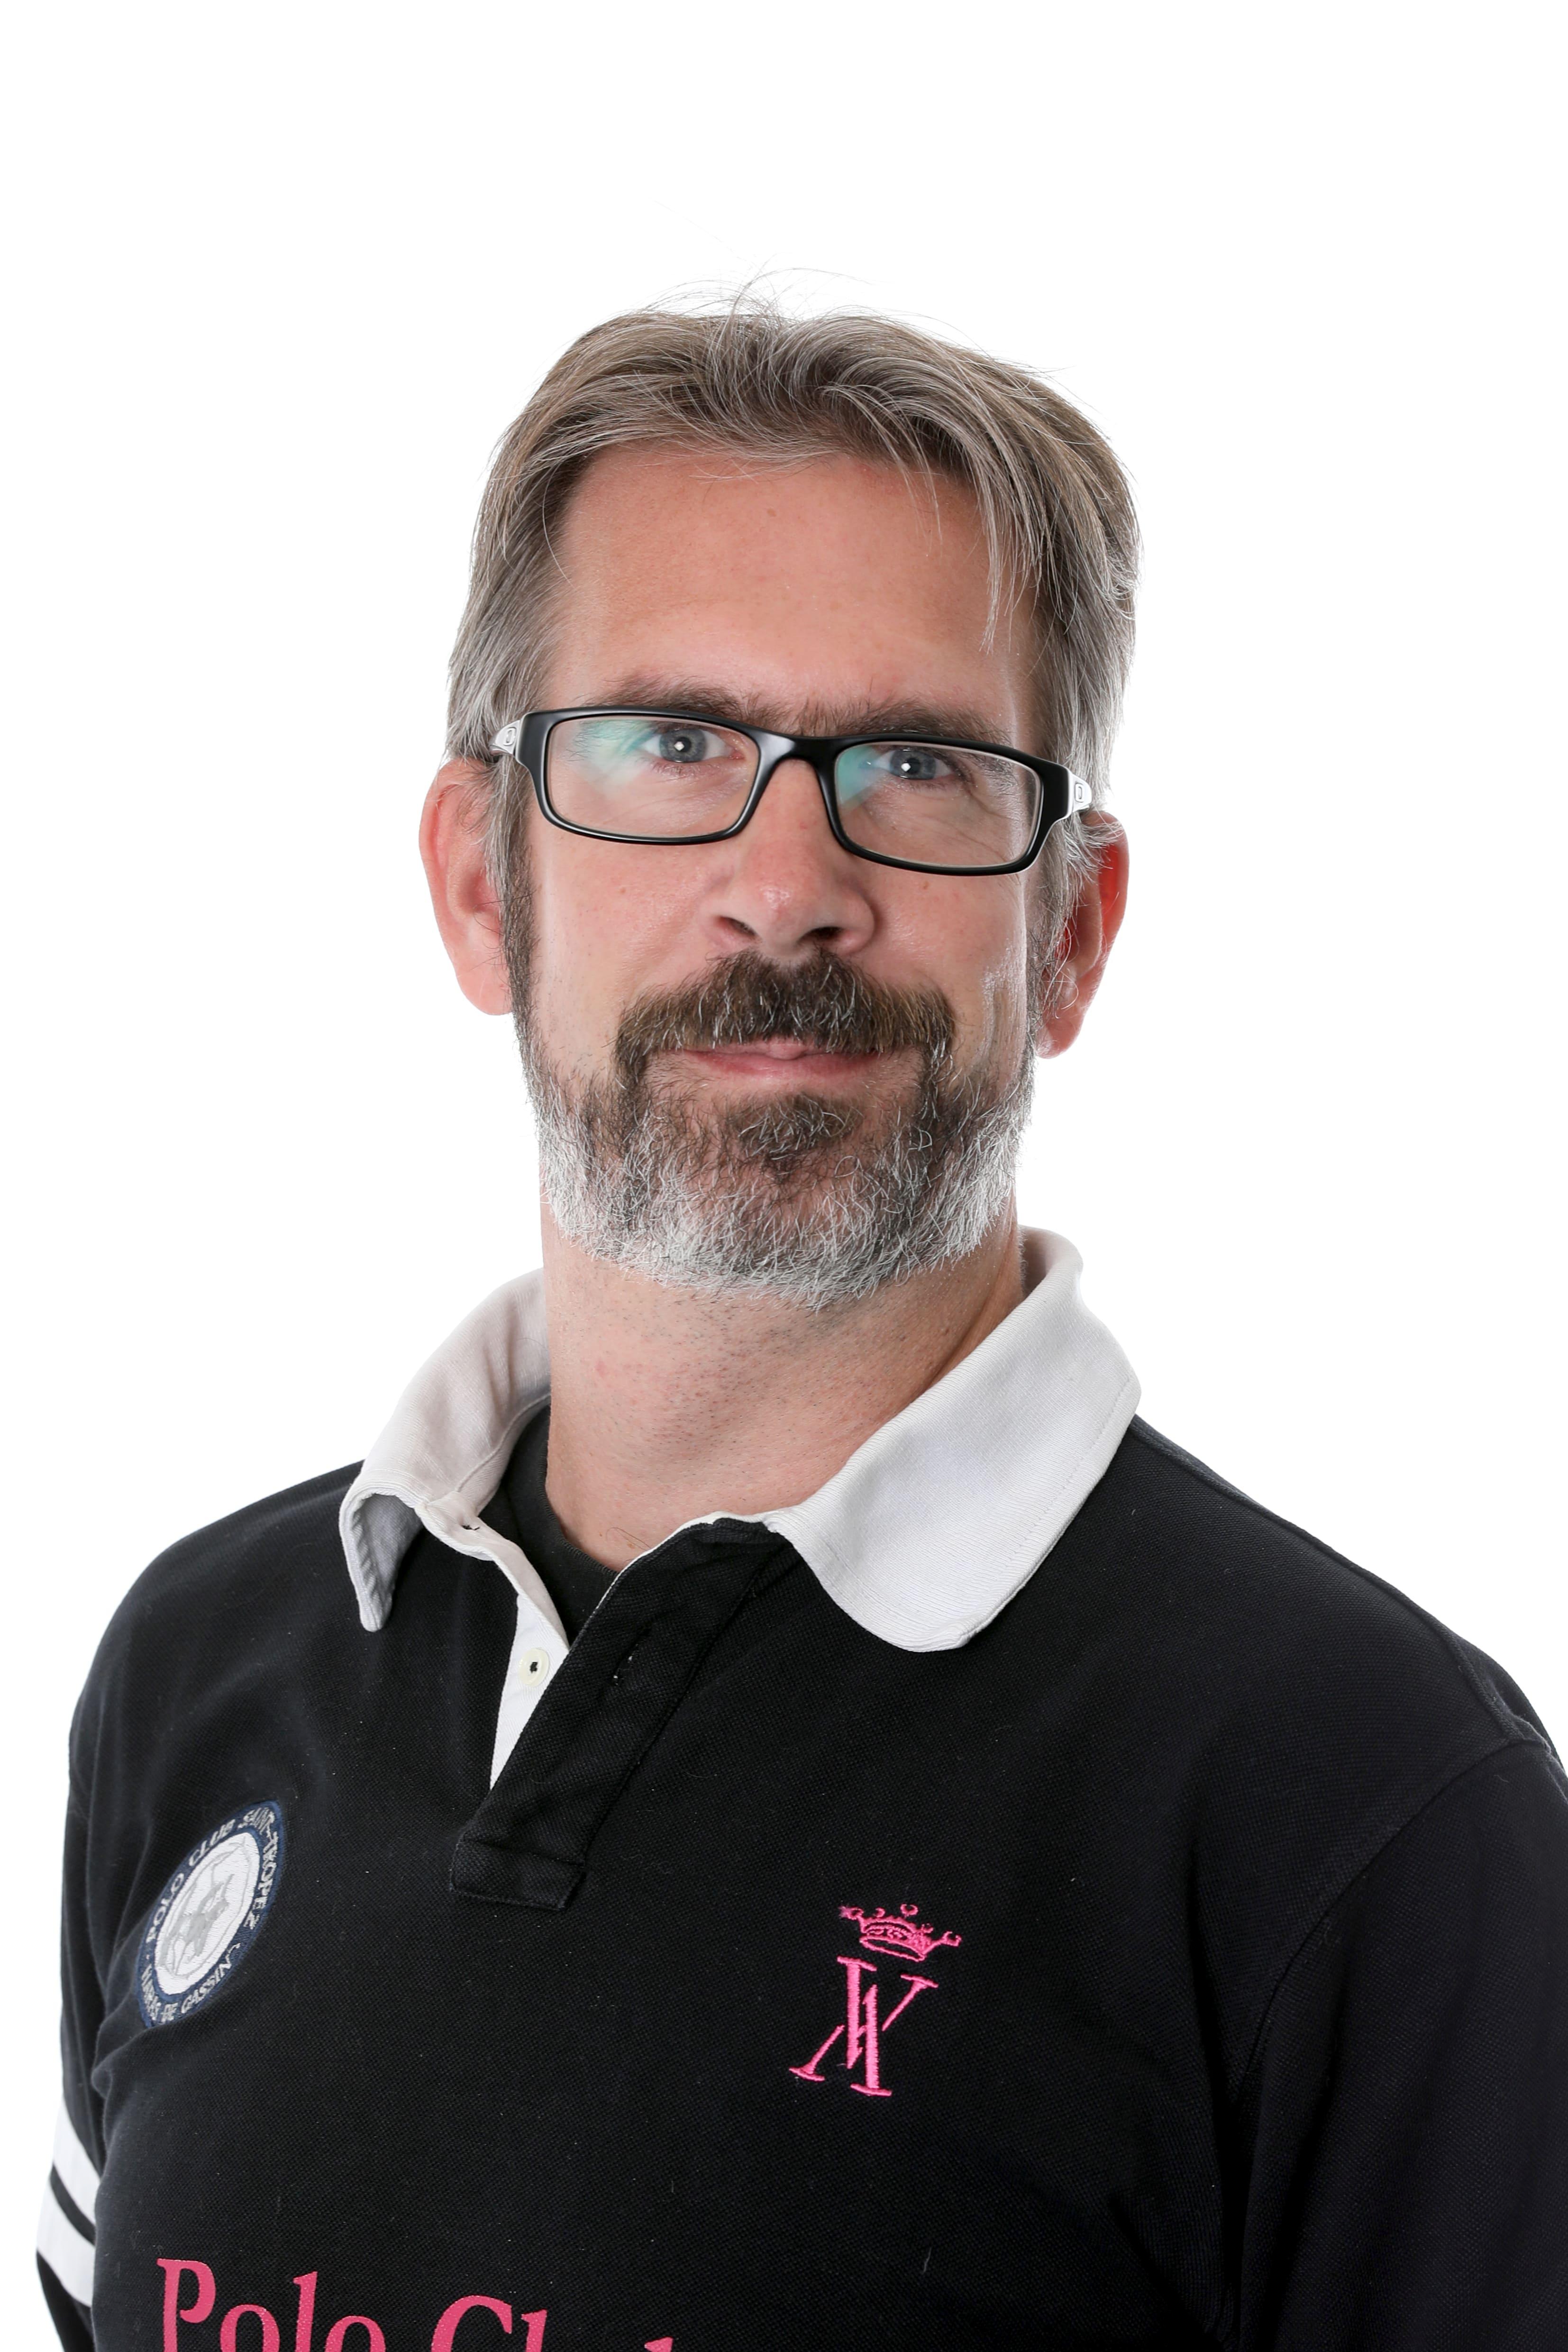 David Kuonen